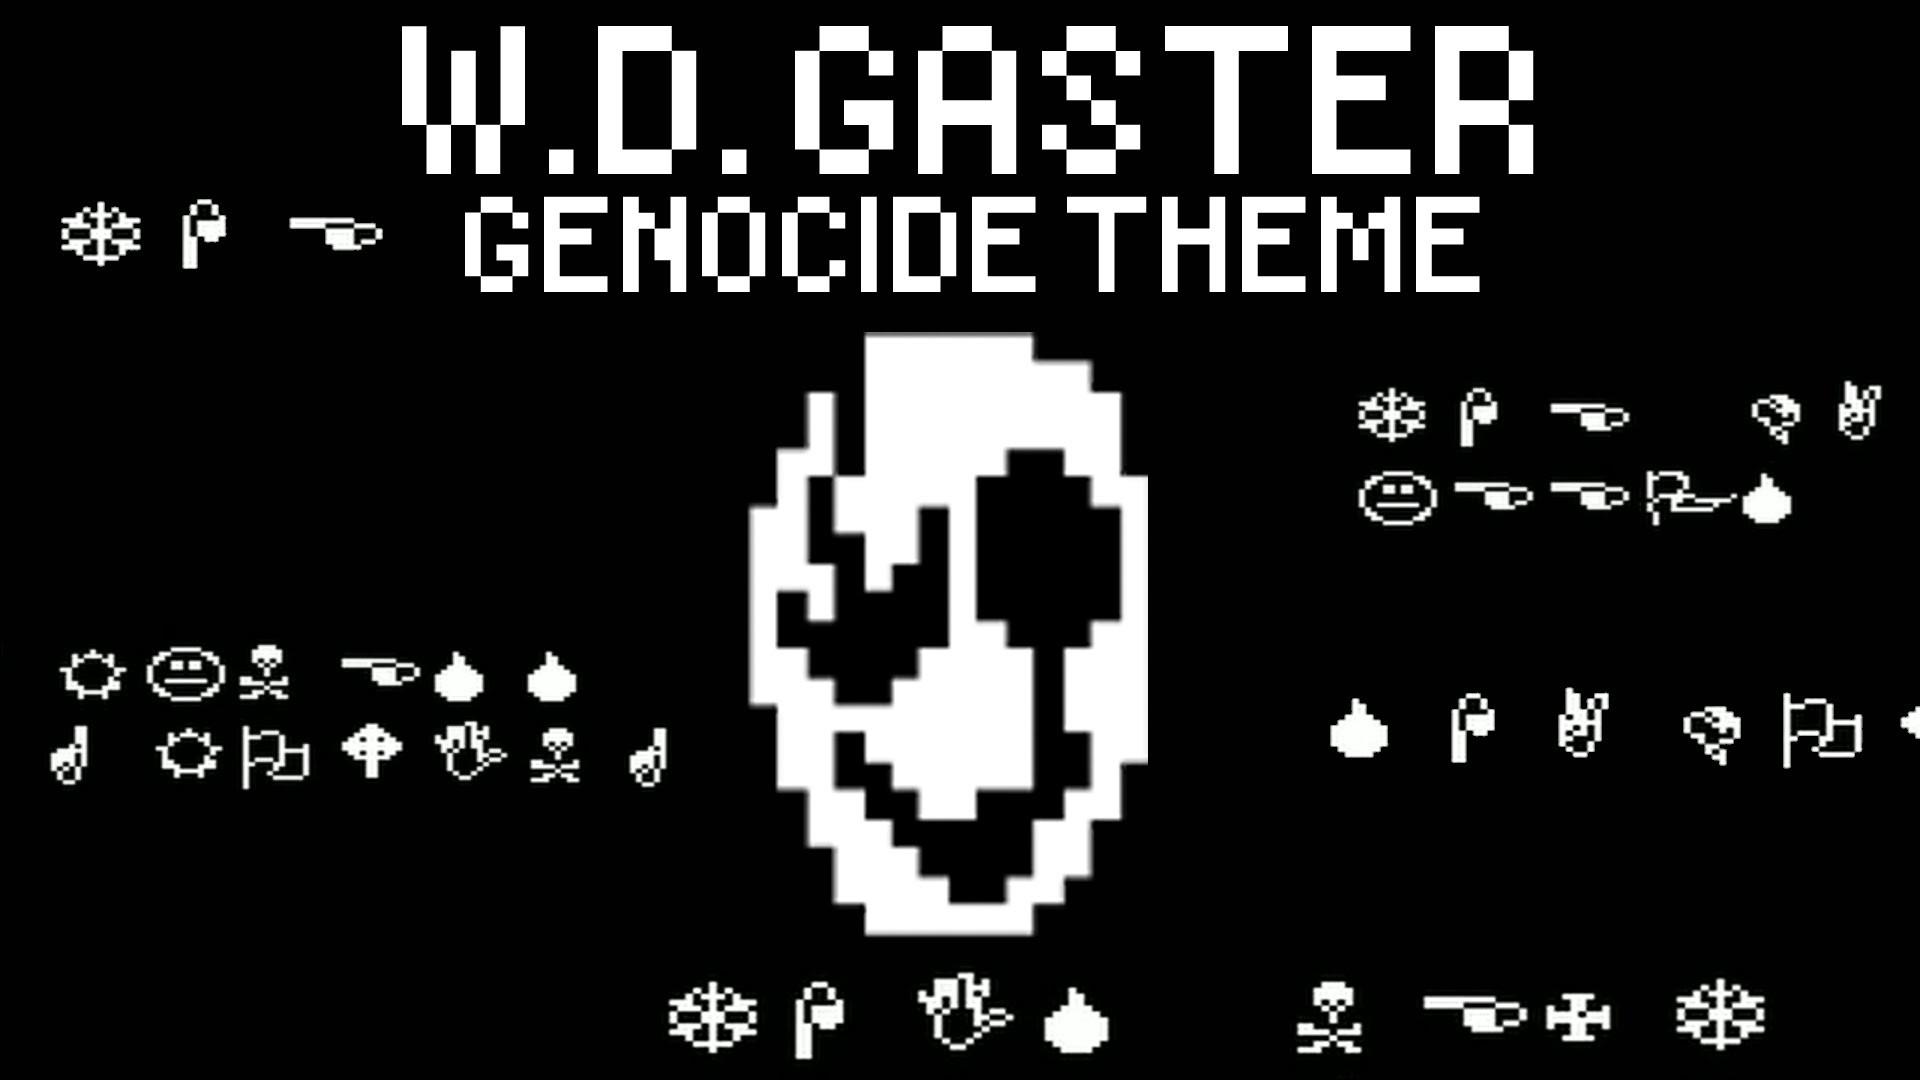 【Hellkite】Undertale – W.D. GASTER (Genocide Theme) – YouTube